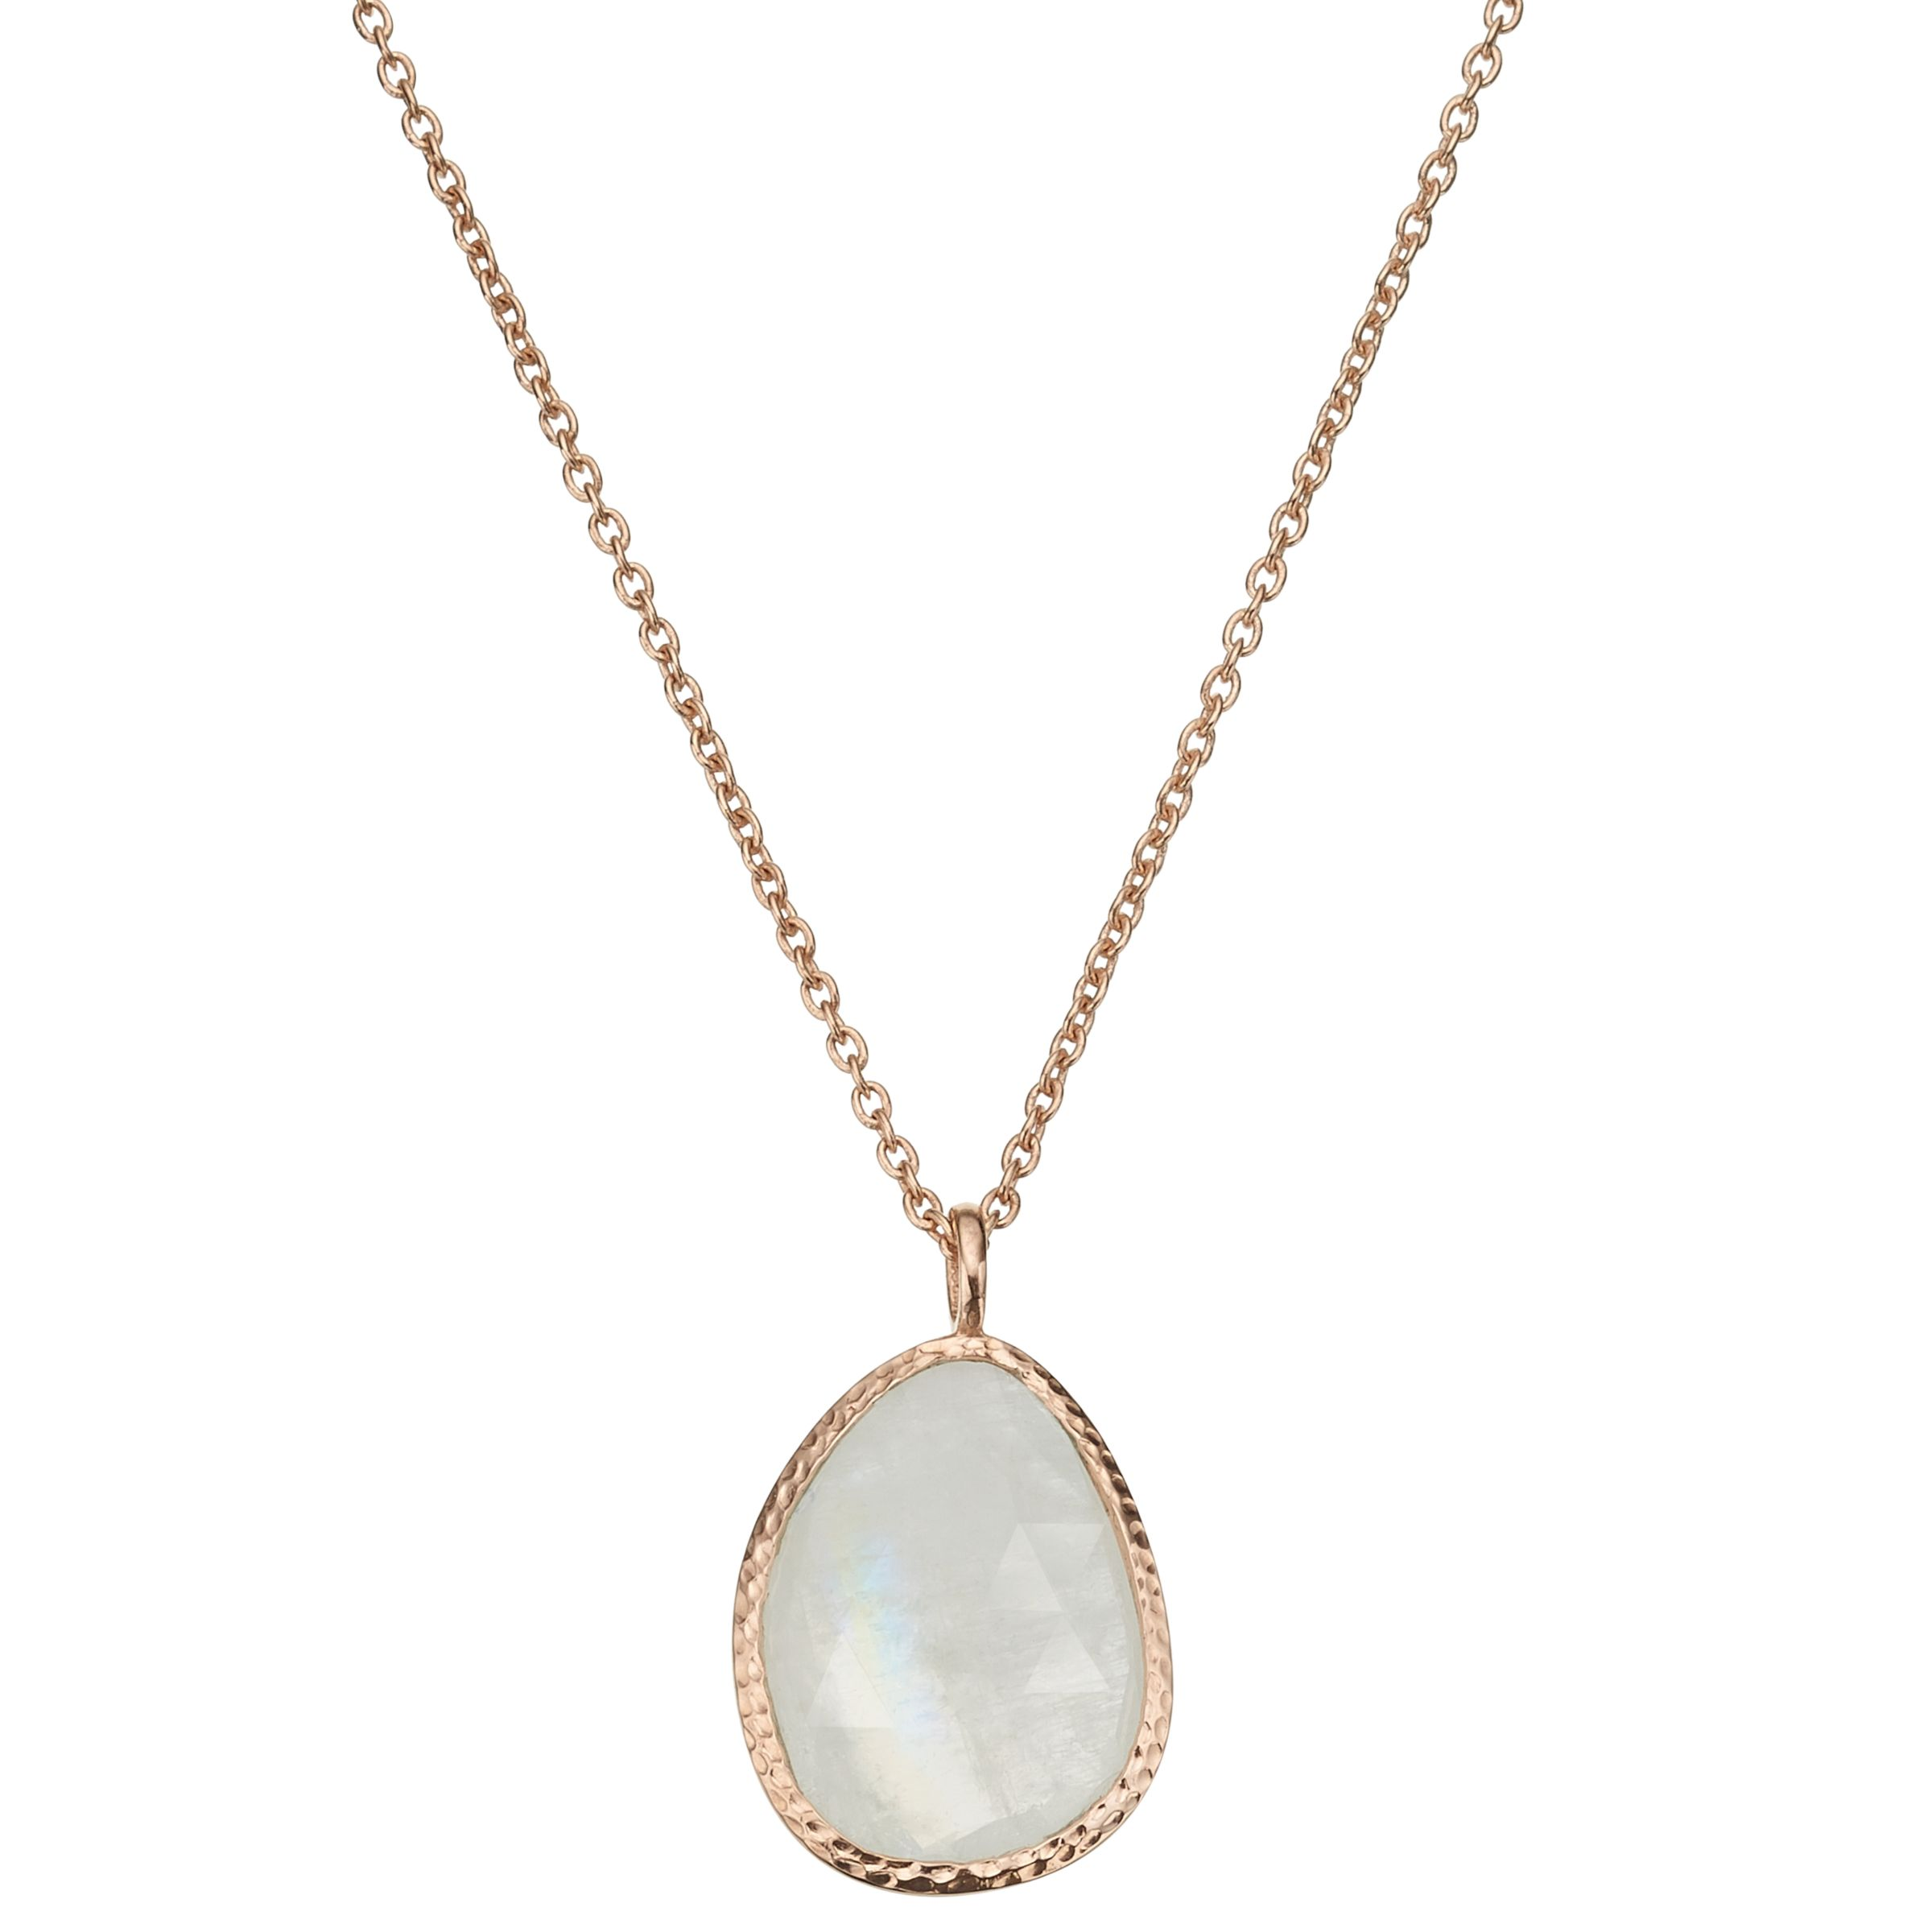 John Lewis Gemstones John Lewis Gemstones Organic Shape Rainbow Moonstone Pendant Necklace, Rose Gold/Multi